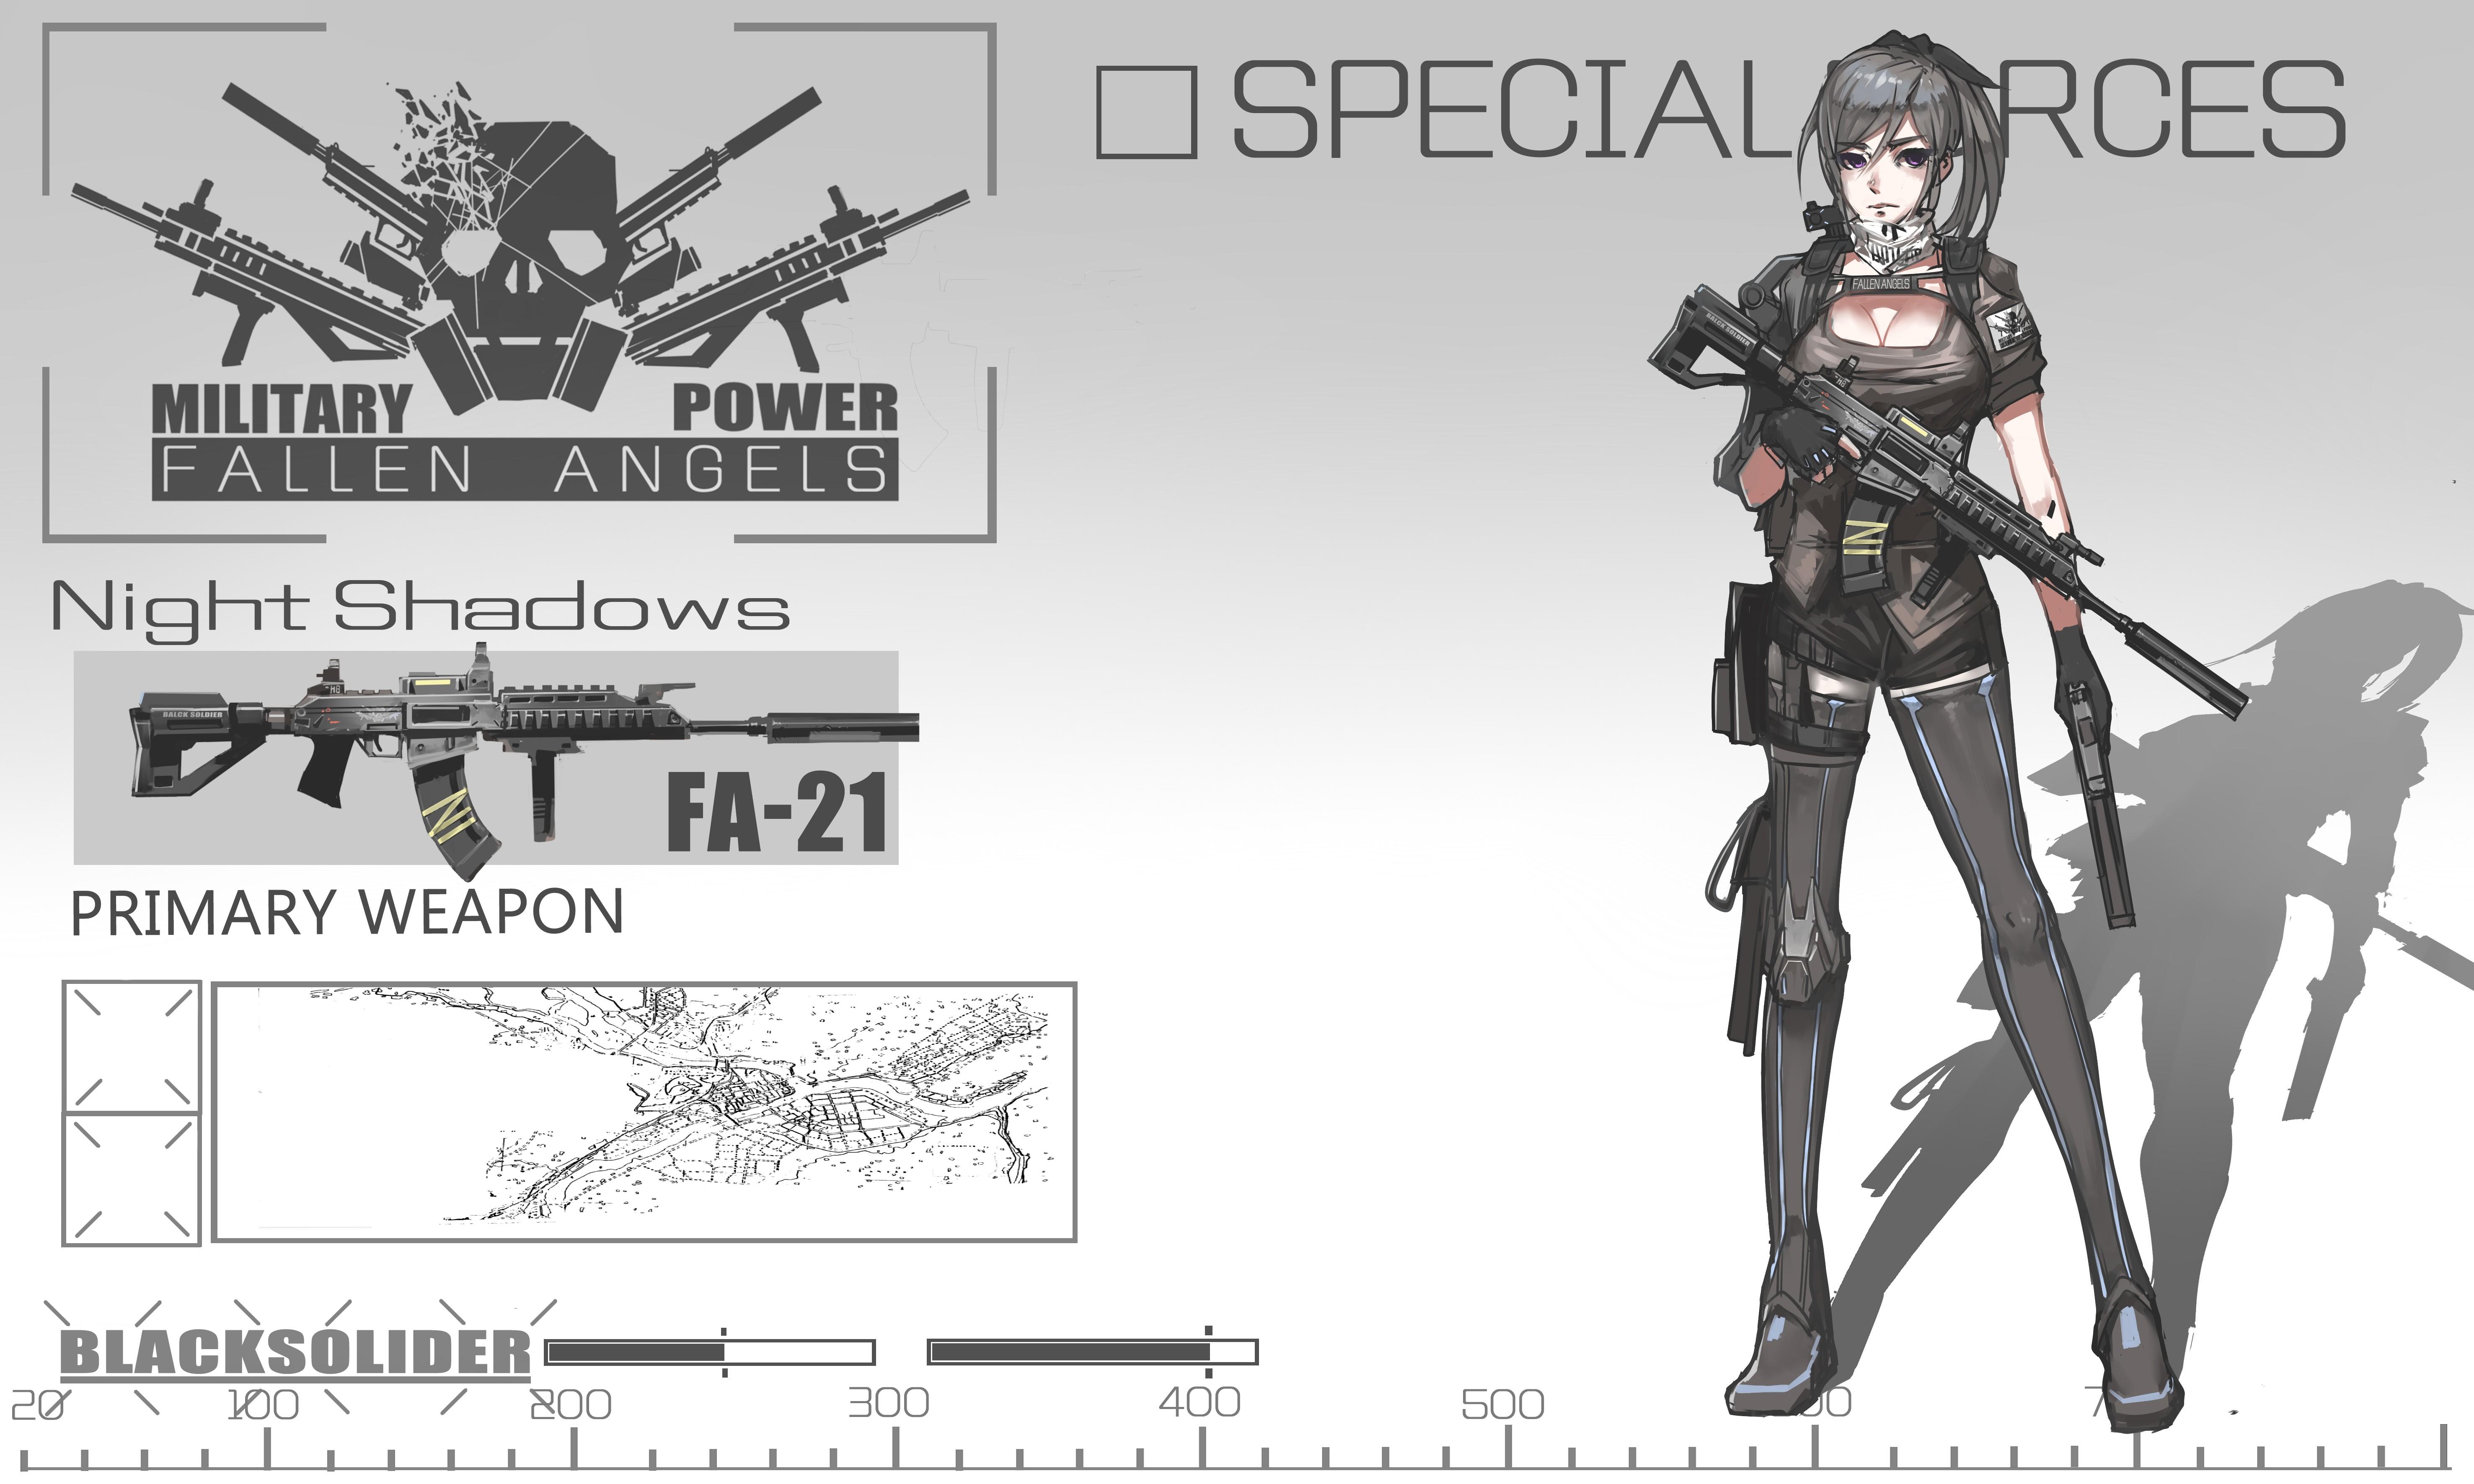 Wallpaper Drawing Gun Anime Girls Short Hair Weapon Soldier Cartoon Pink Eyes Machine Grey Hair Black Soldier Sketch 5905x3543 Cartergeneration 40137 Hd Wallpapers Wallhere